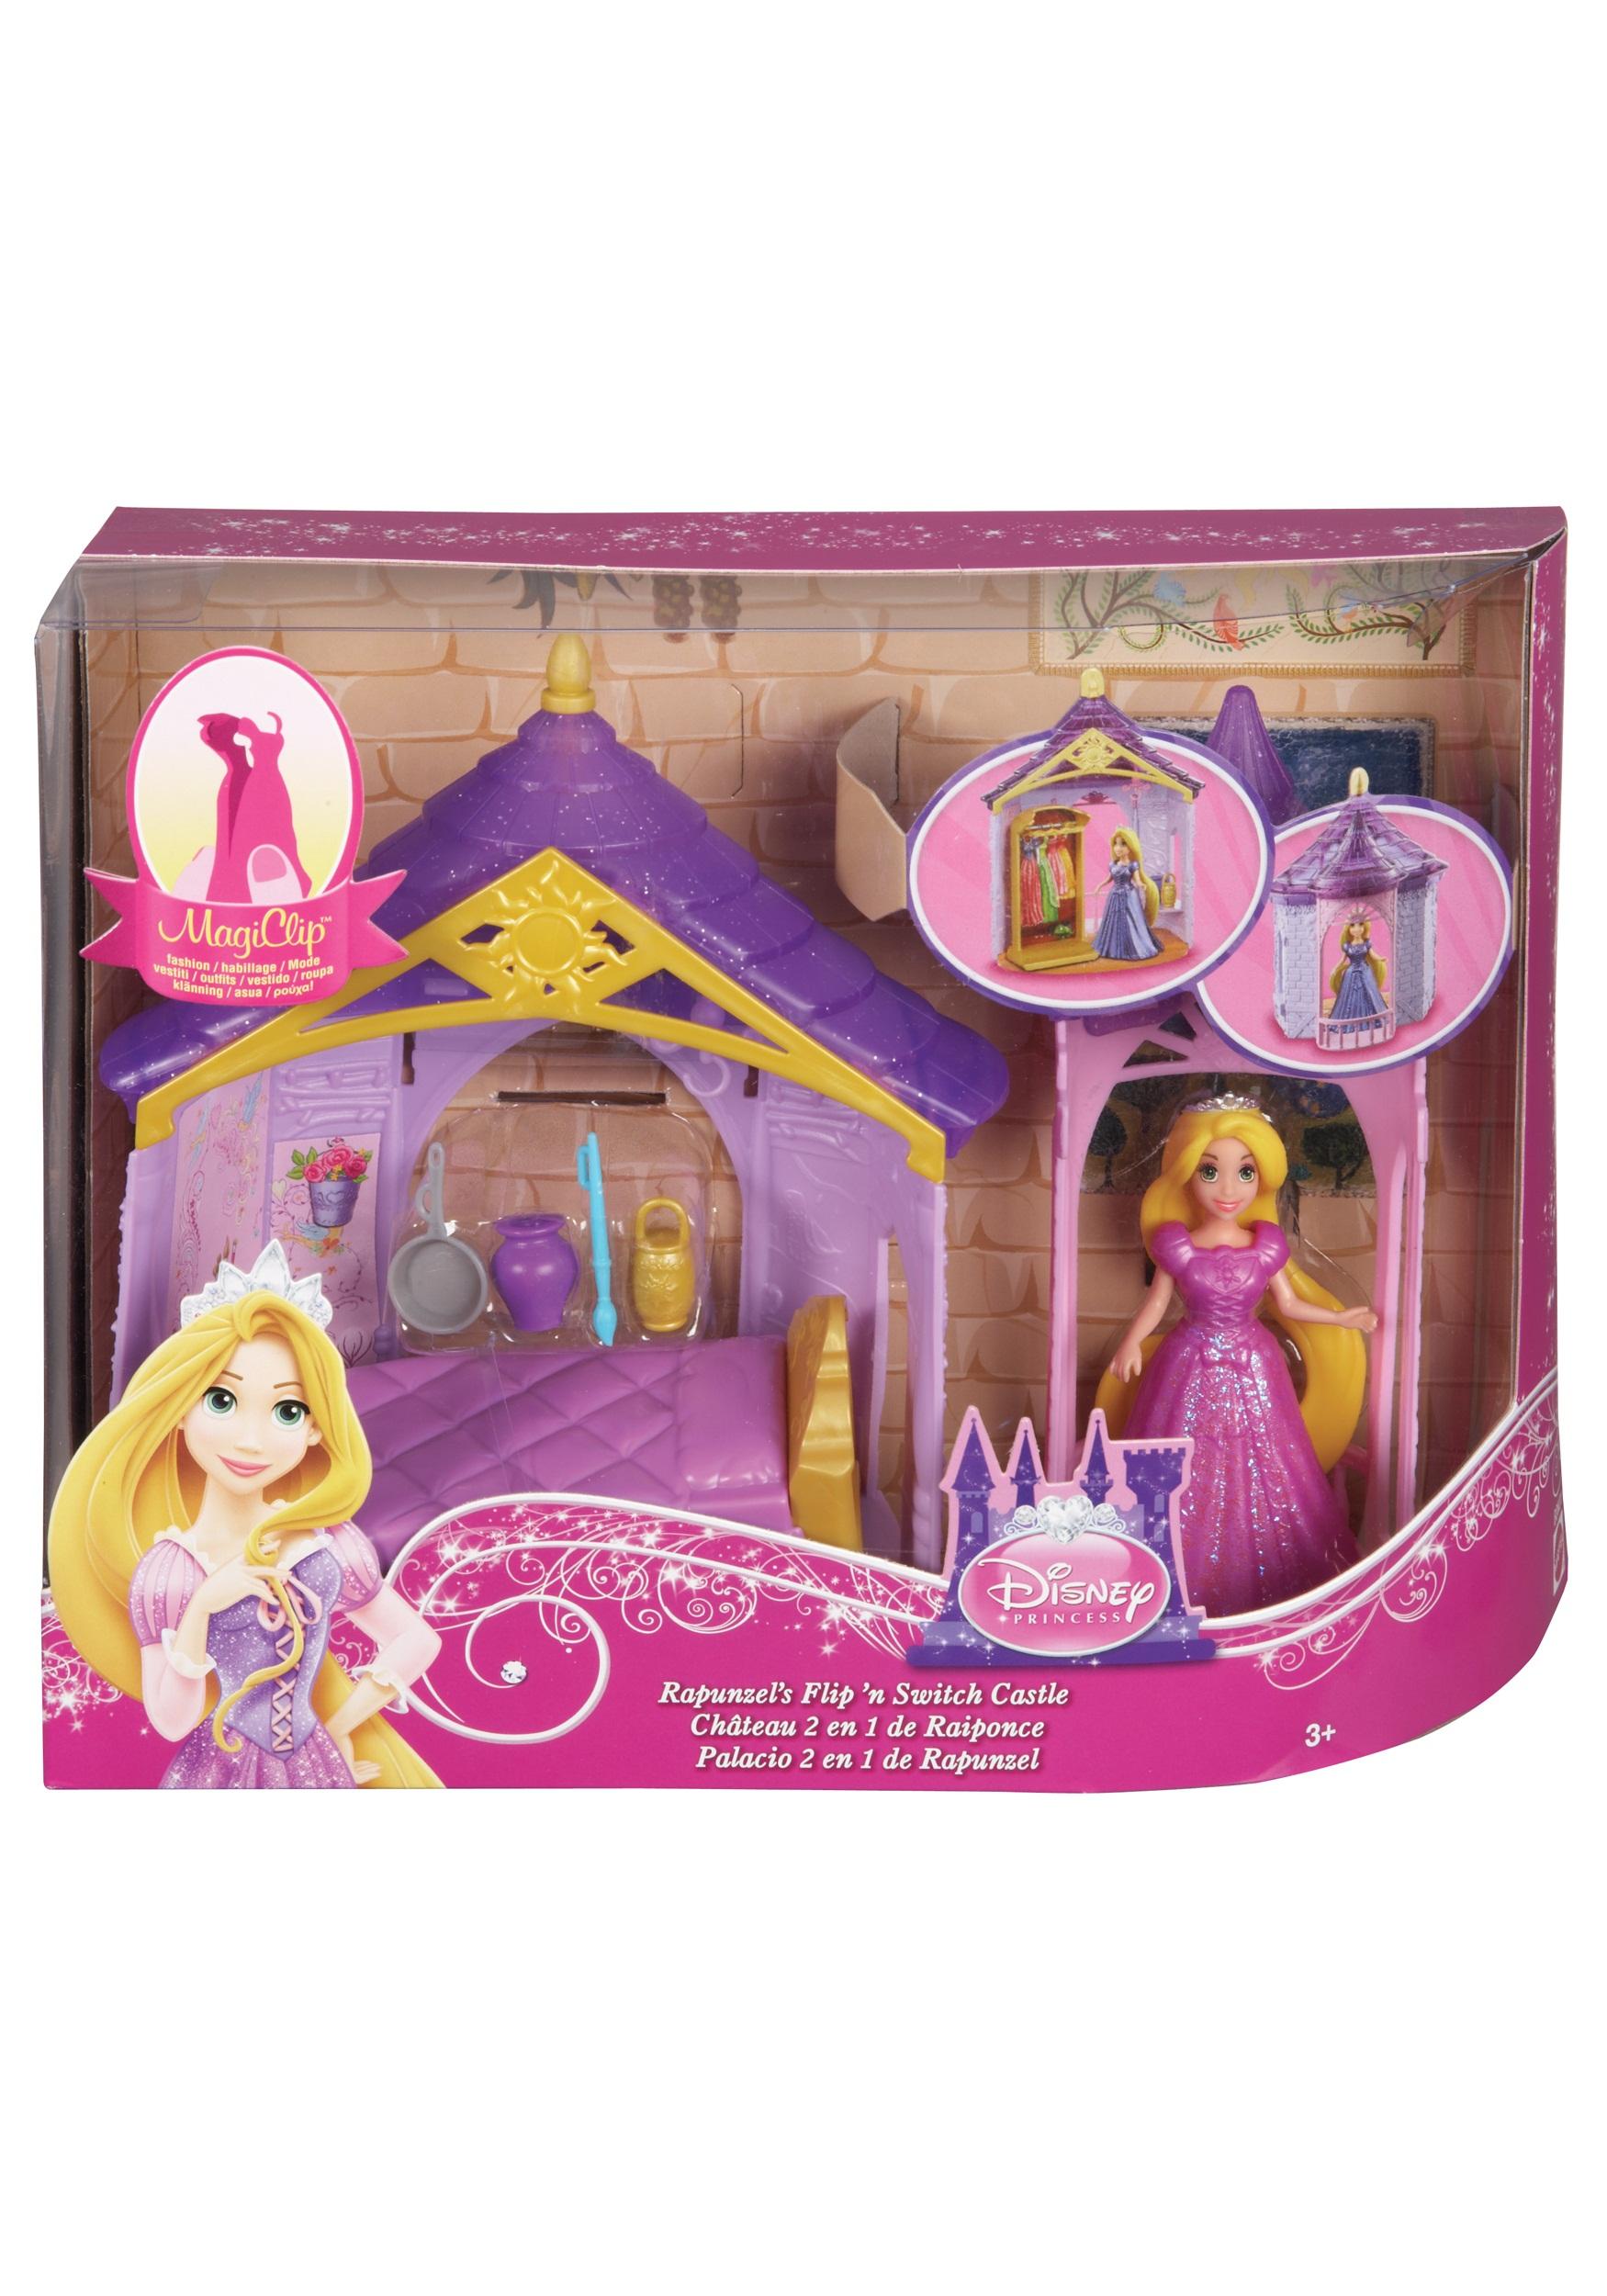 Disney princess little kingdom magiclip rapunzel for Small princess